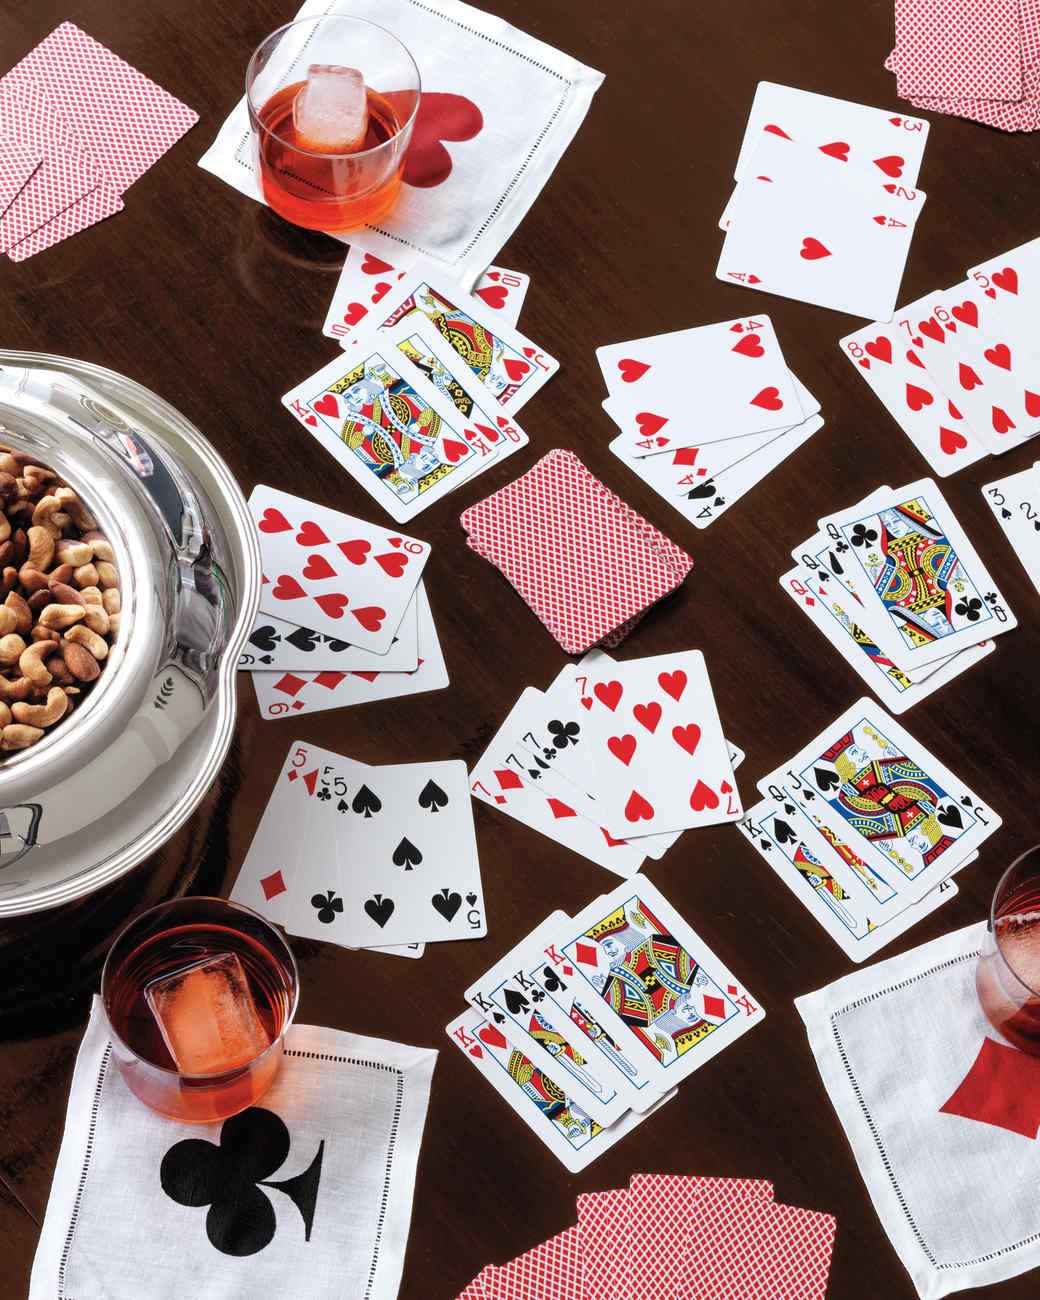 playing-cards-mld108553.jpg